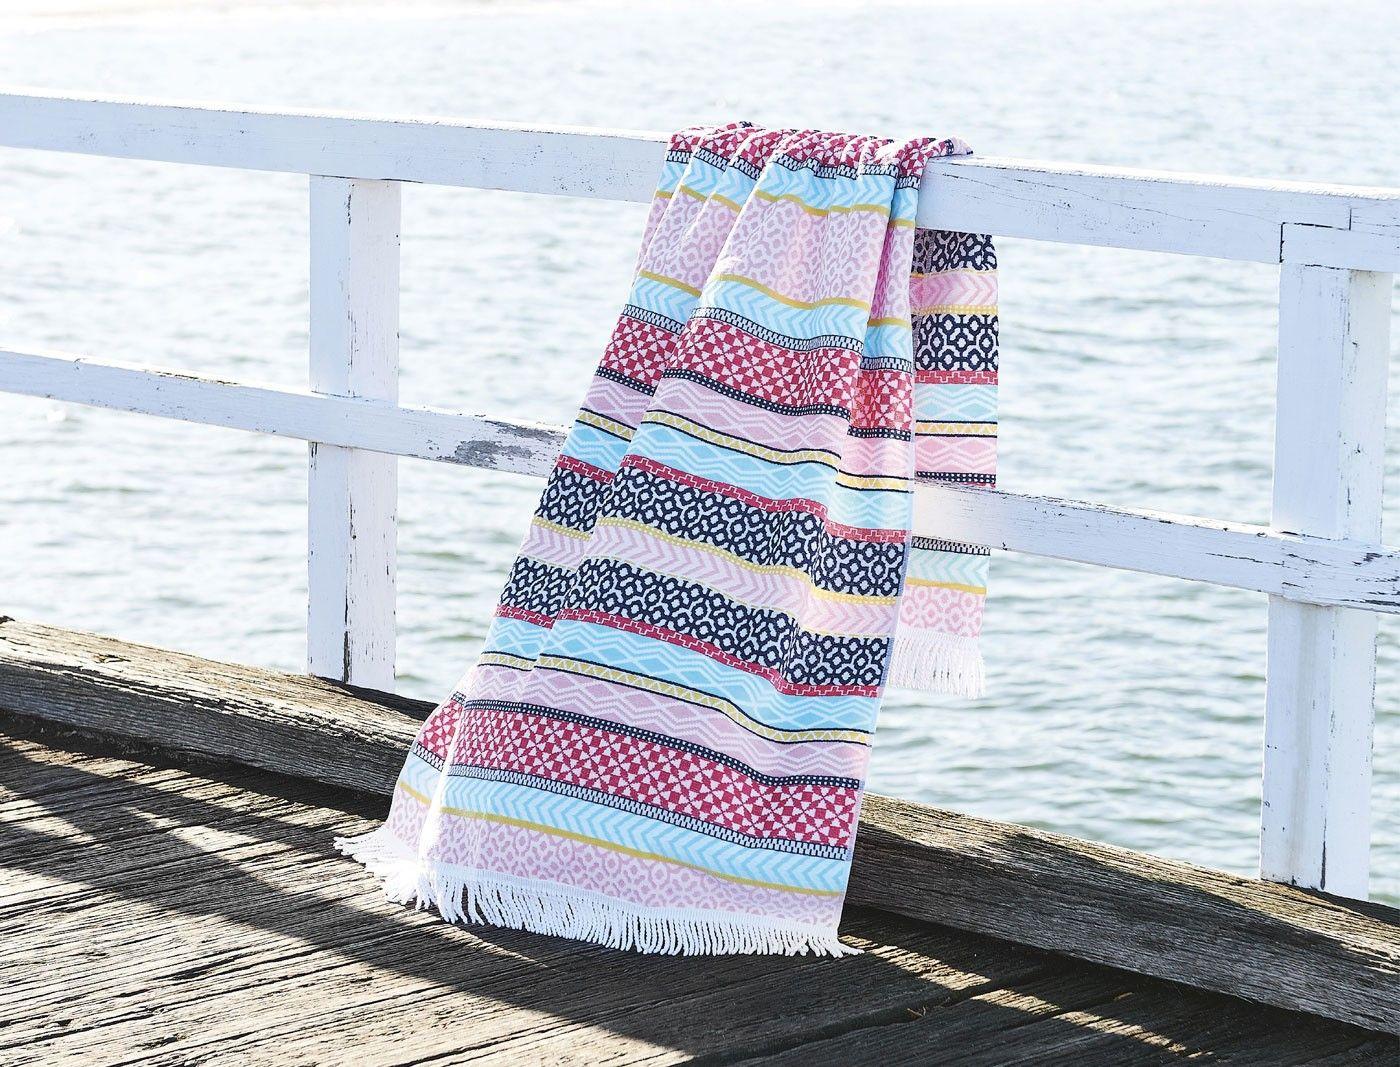 The Morgan Finch Syracuse Beach Towel